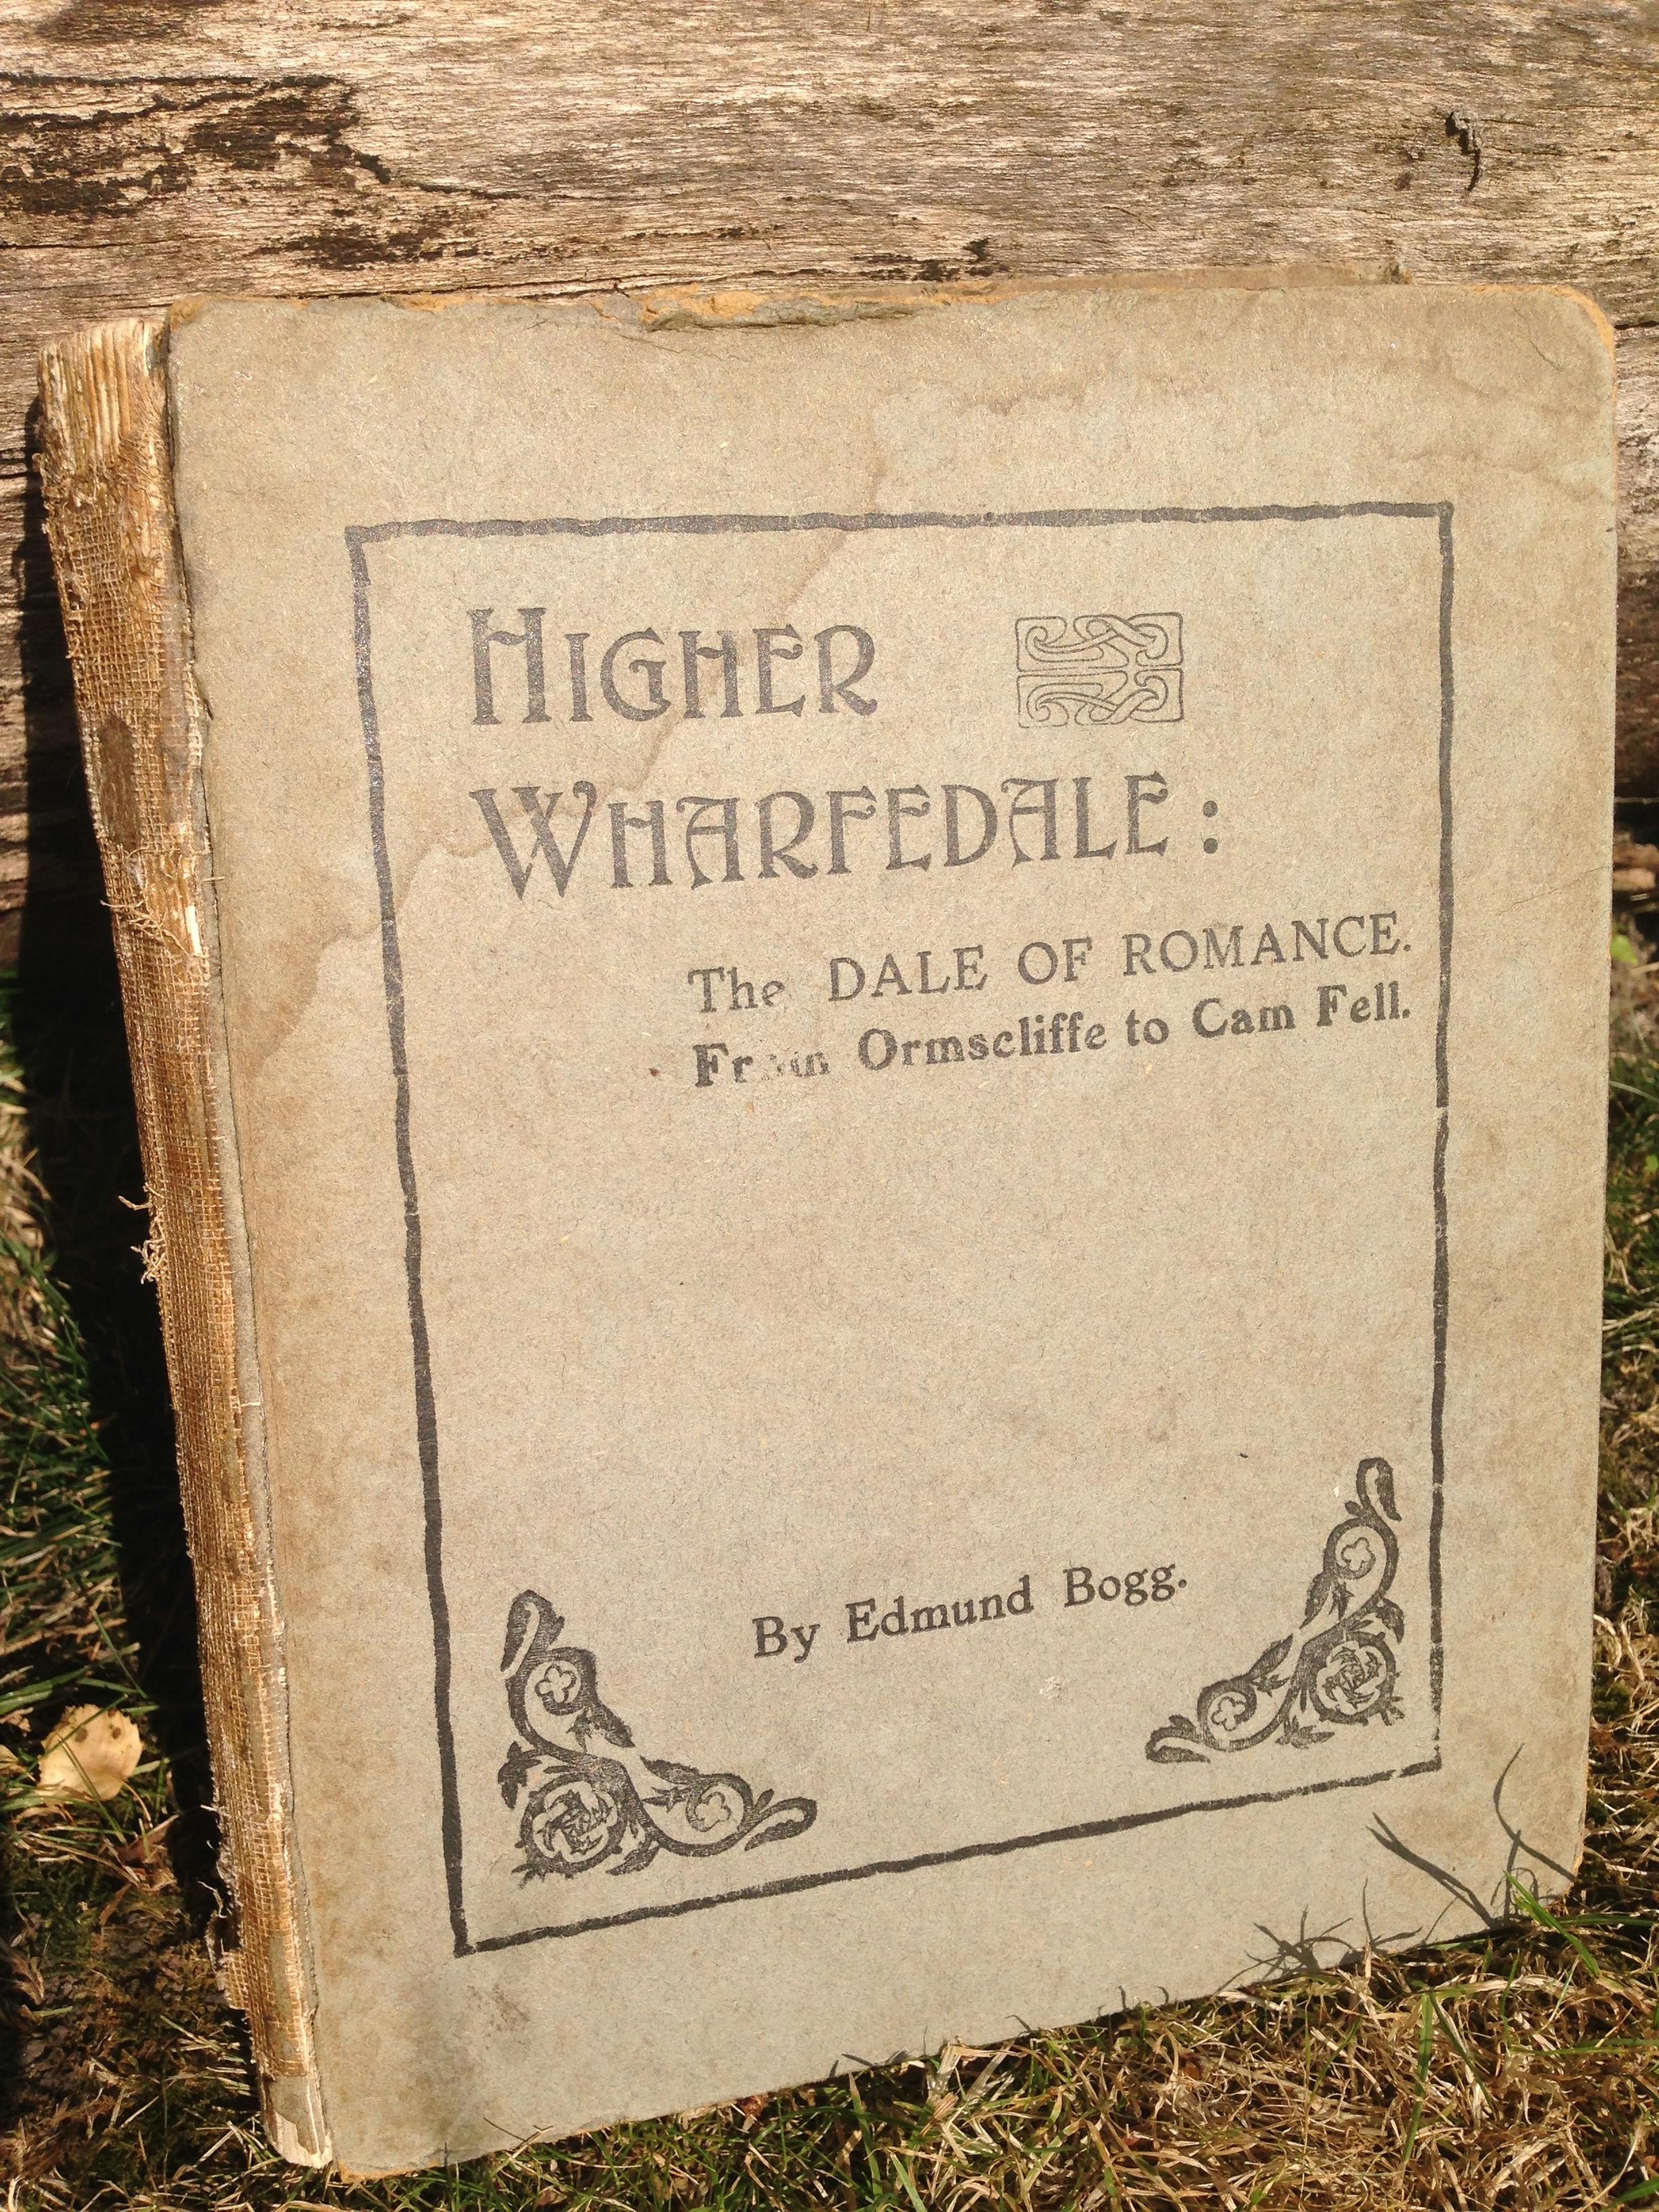 Higher Wharfdale - Edmund Bogg